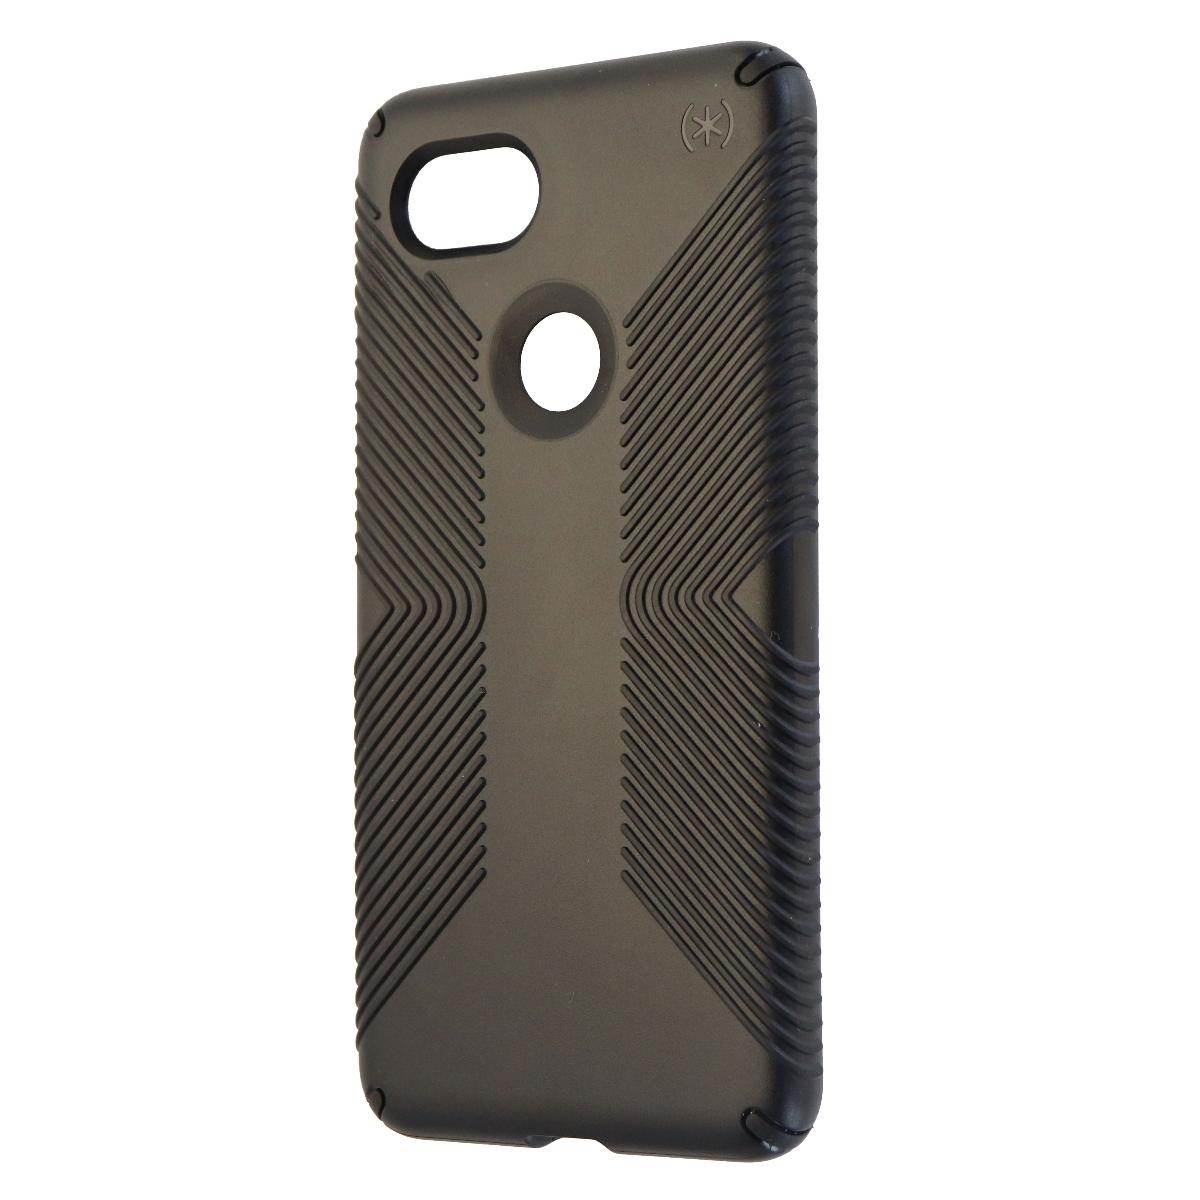 Speck Presidio Grip Series Protective Case Cover for Google Pixel 2 XL - Black